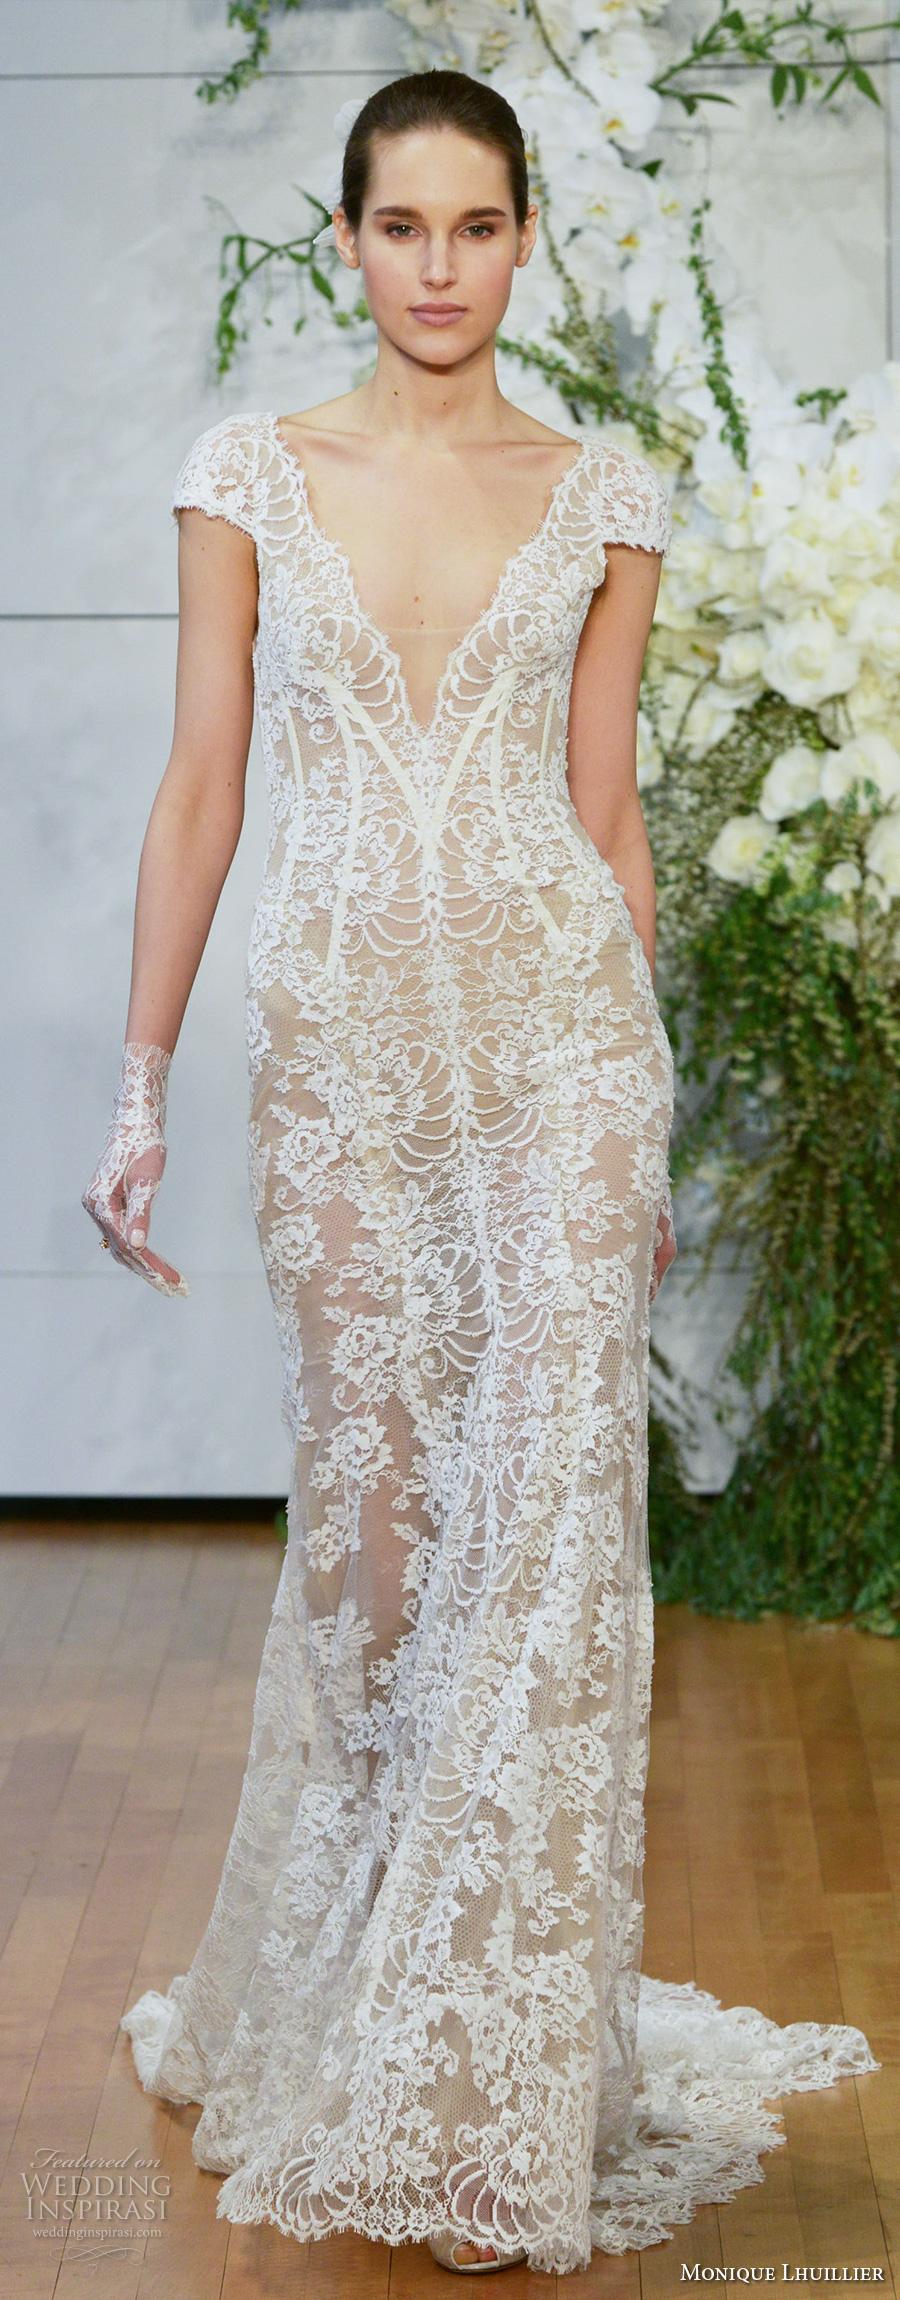 monique lhuillier spring 2018 bridal cap sleeves deep v neck full embellishment lace elegant sheath wedding dress open scoop back chapel back (arden) zv